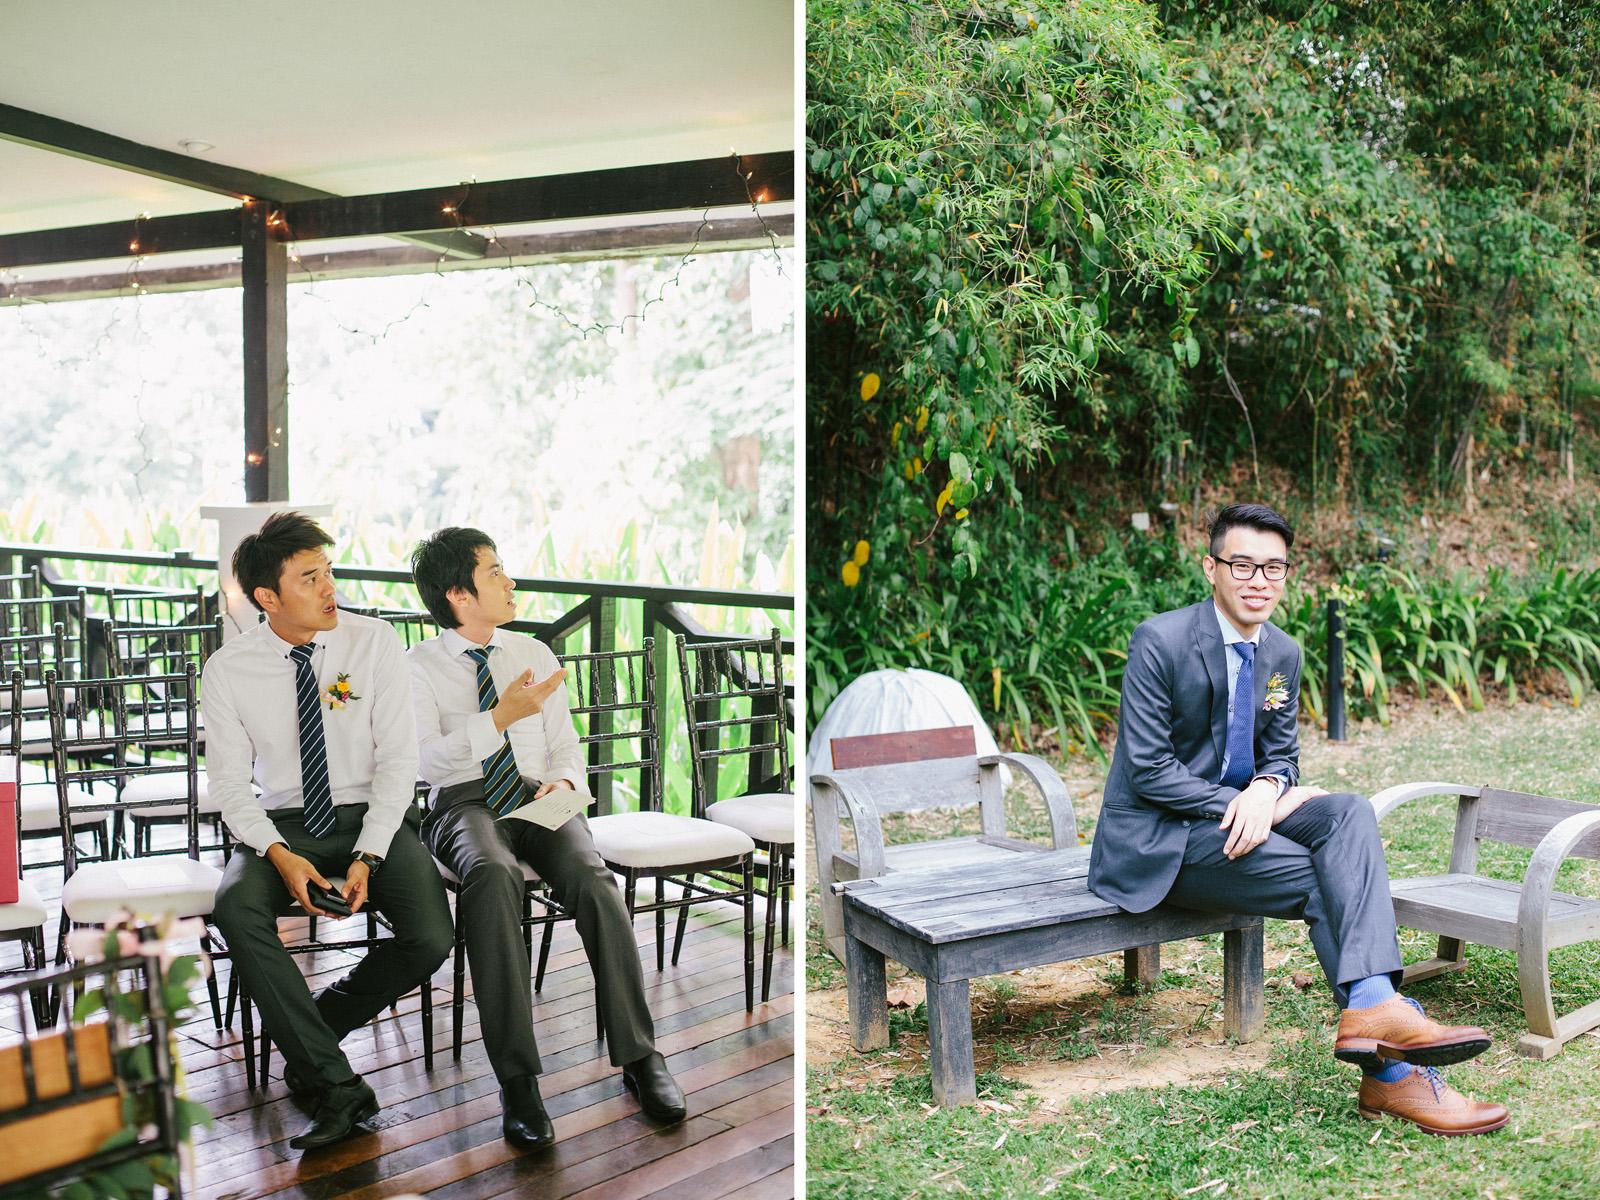 singapore-wedding-travel-photographer-faith-alvin-wedding-wmt-28.jpg